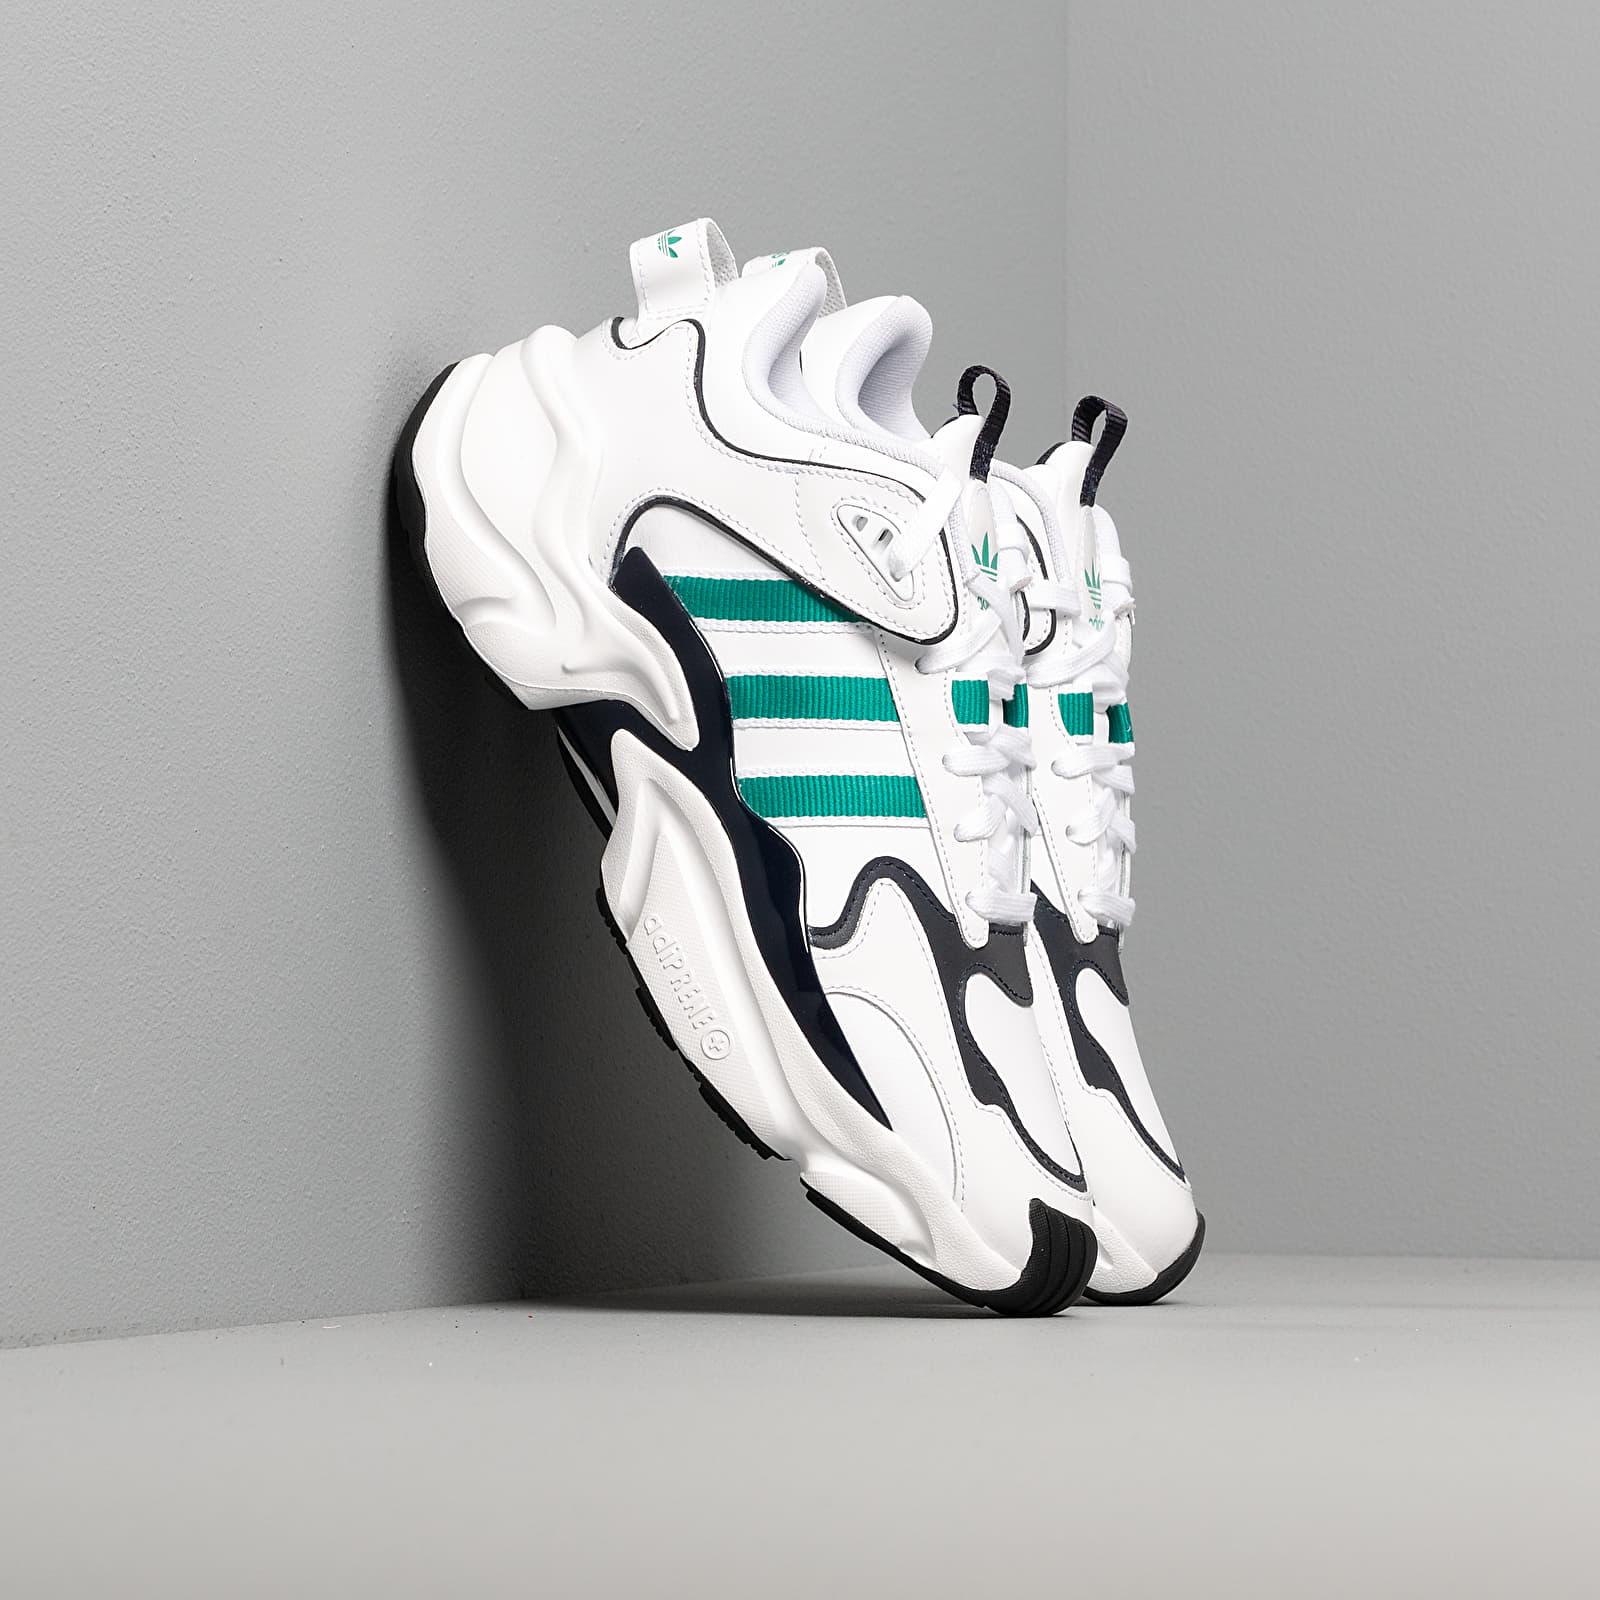 Chaussures et baskets femme adidas Magmur Runner W Ftw White/ Glow Green/ Legend Ink